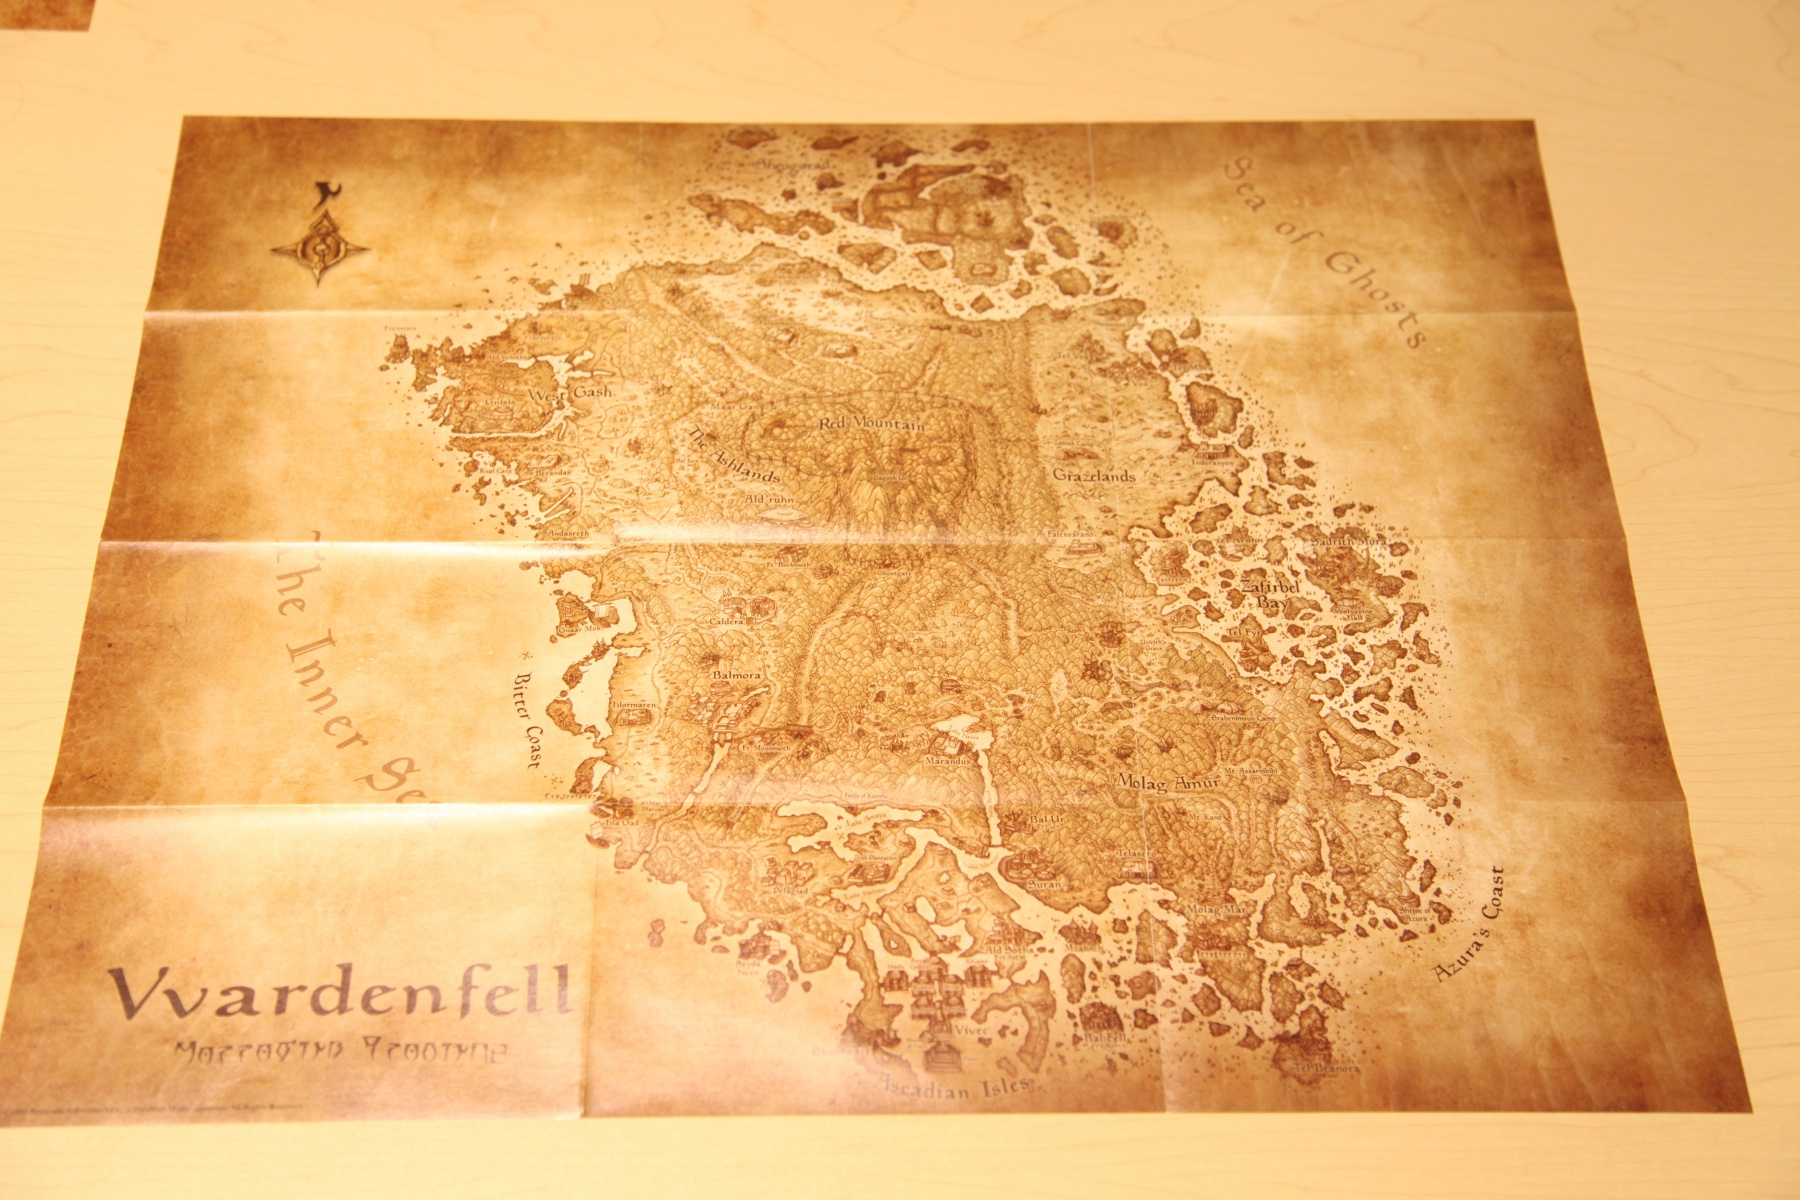 The Escapist Bravely Unboxes The Elder Scrolls Anthology